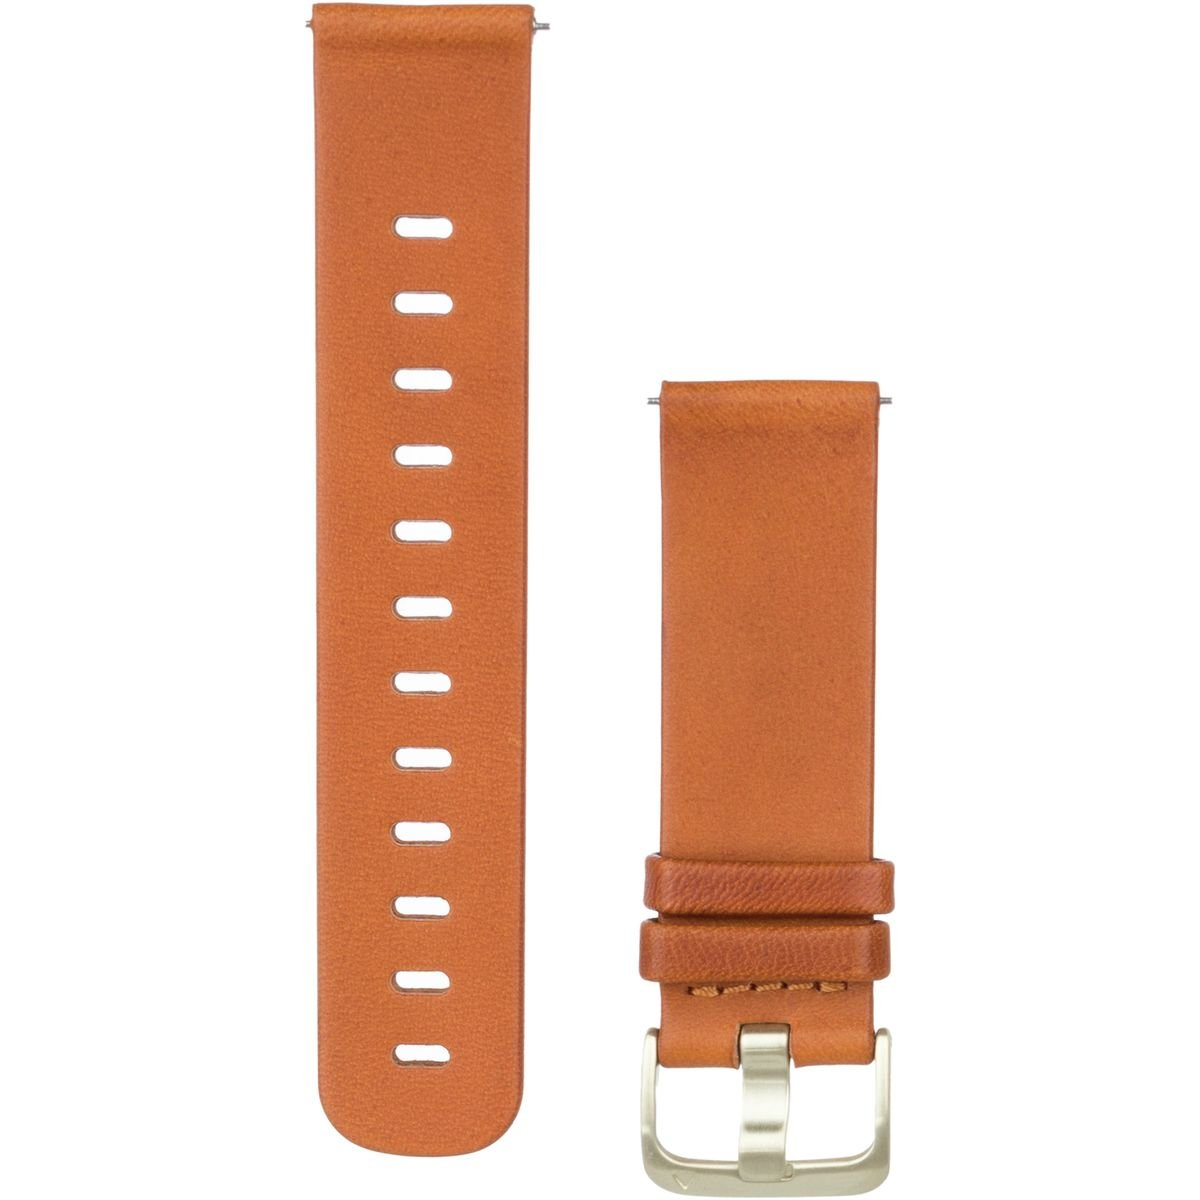 Garmin Quick Release Band - Watch strap - Small/Medium - light brown - for vívoactive 3, vívomove HR Premium, HR Sport One Size Light Brown Leather B07773QNX3